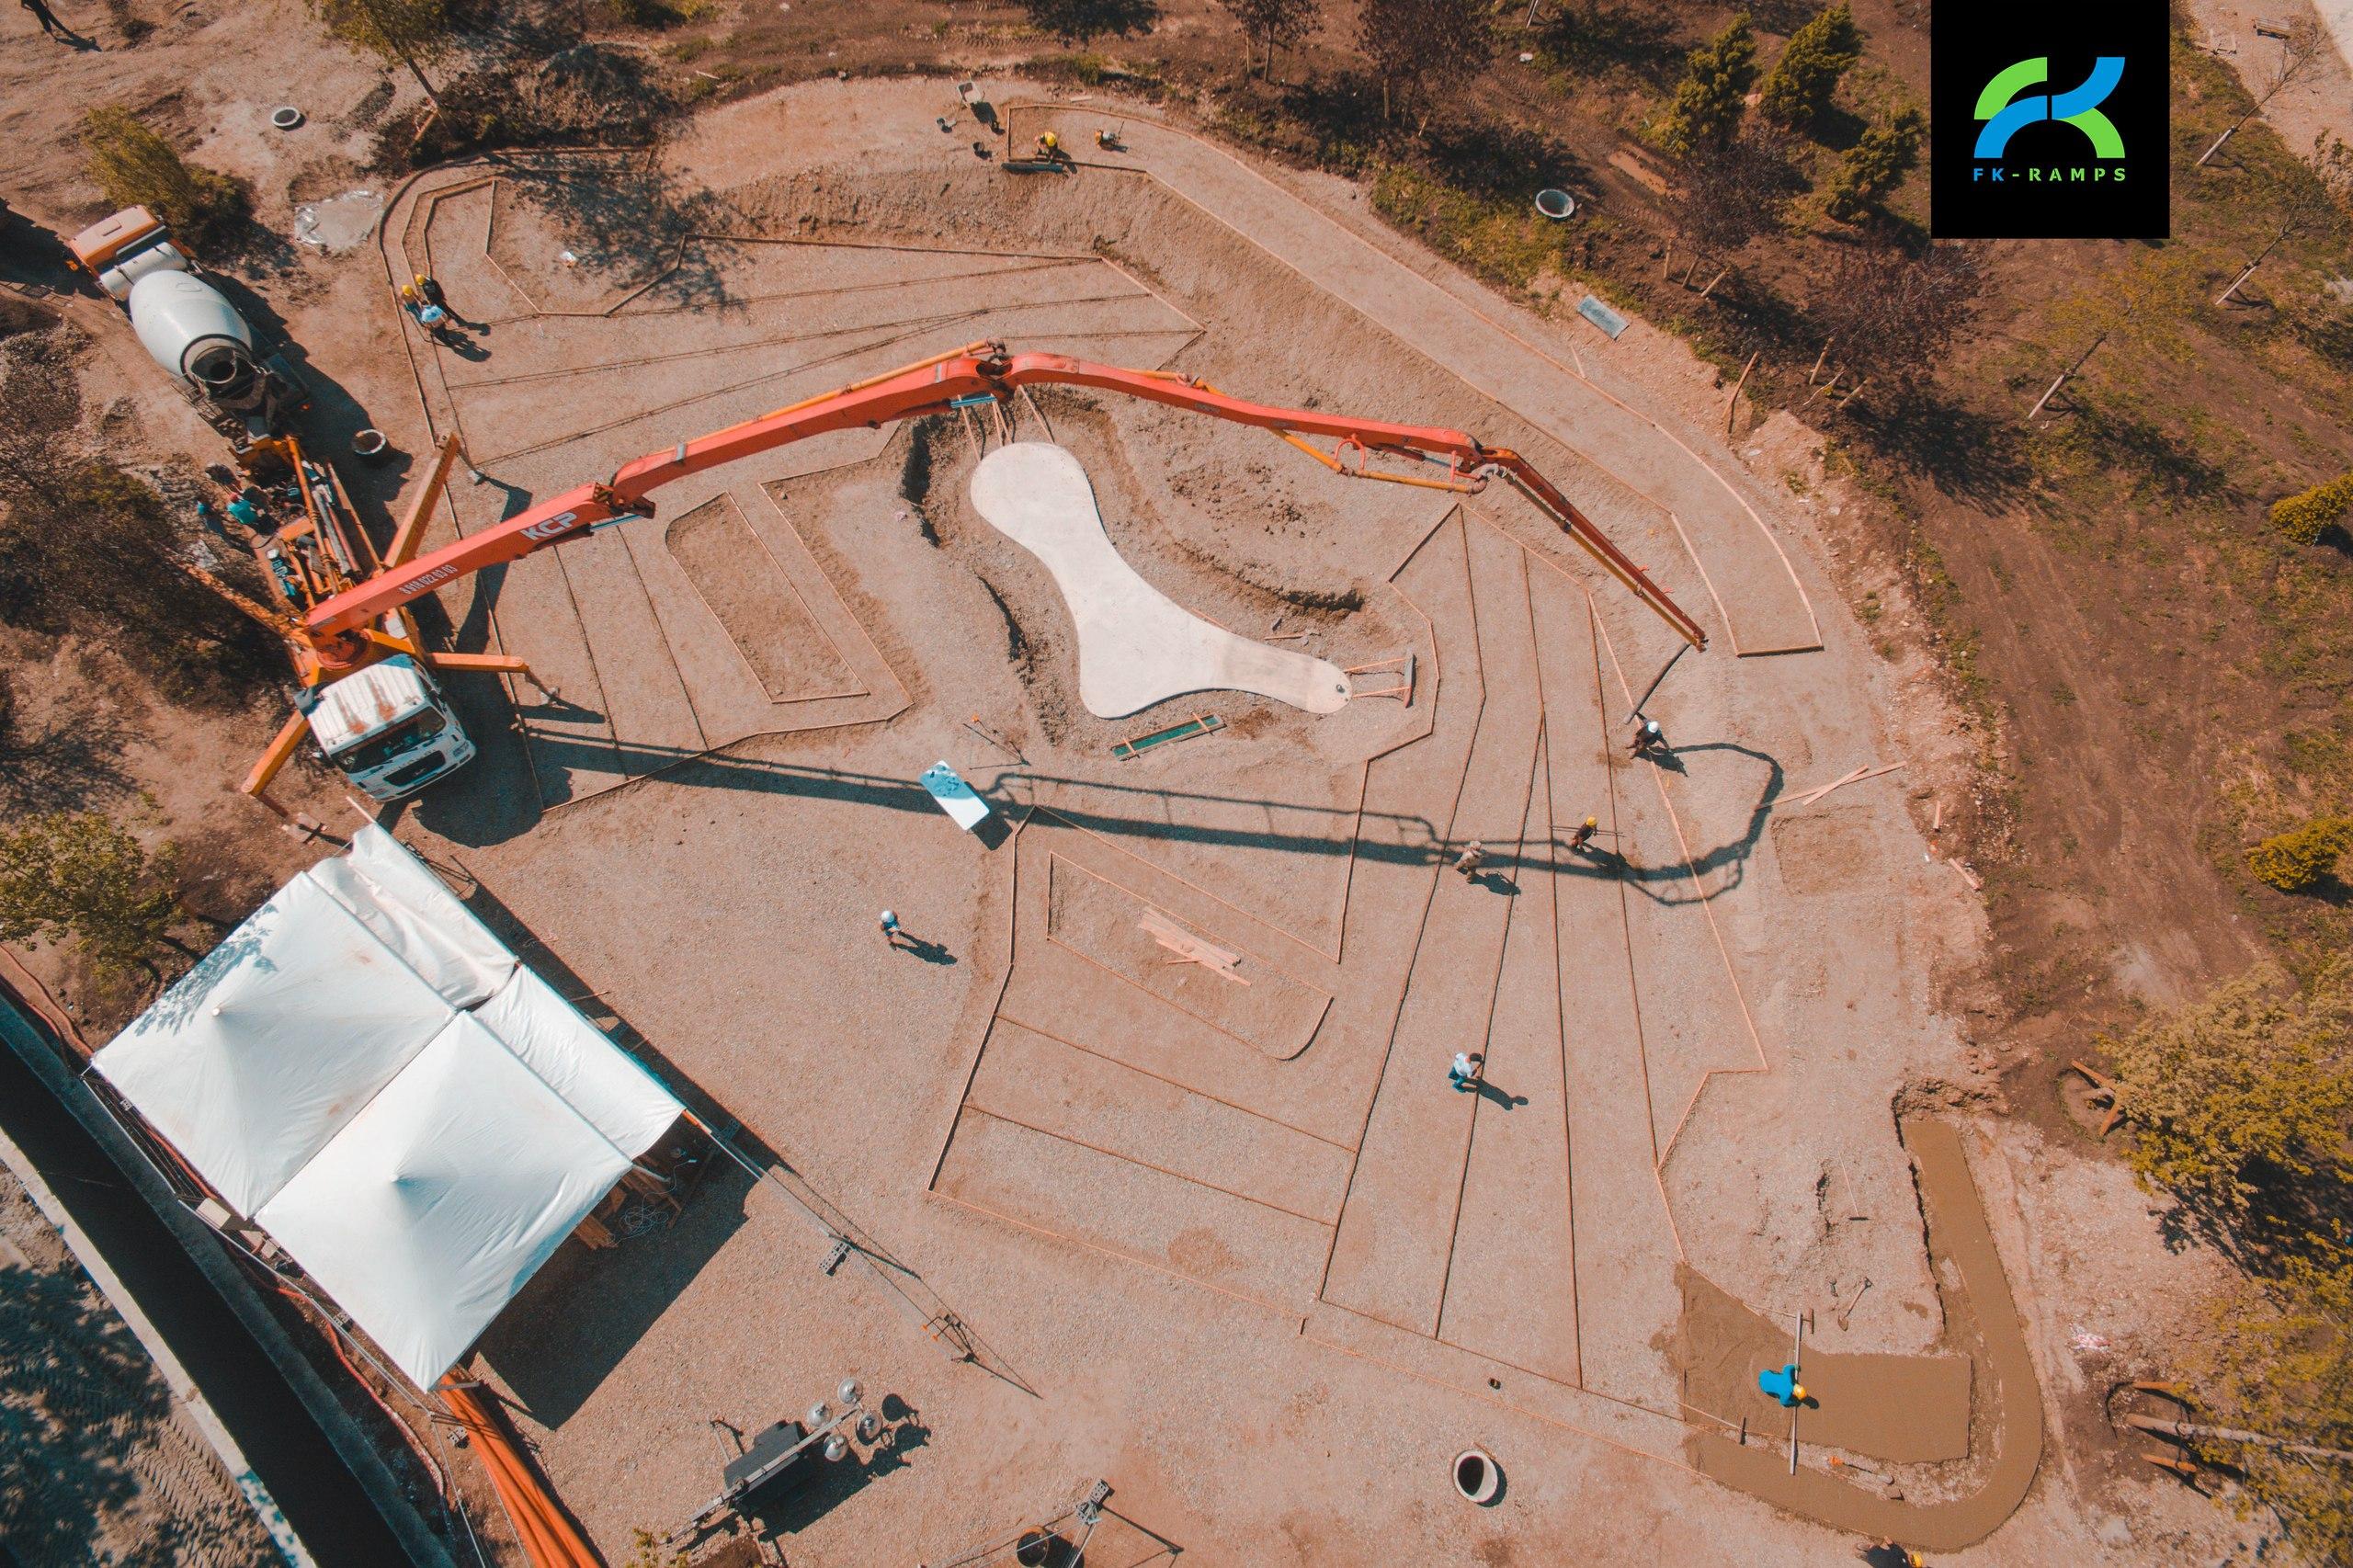 Шпионский кадр со строительства нового бетонного скейт-парка